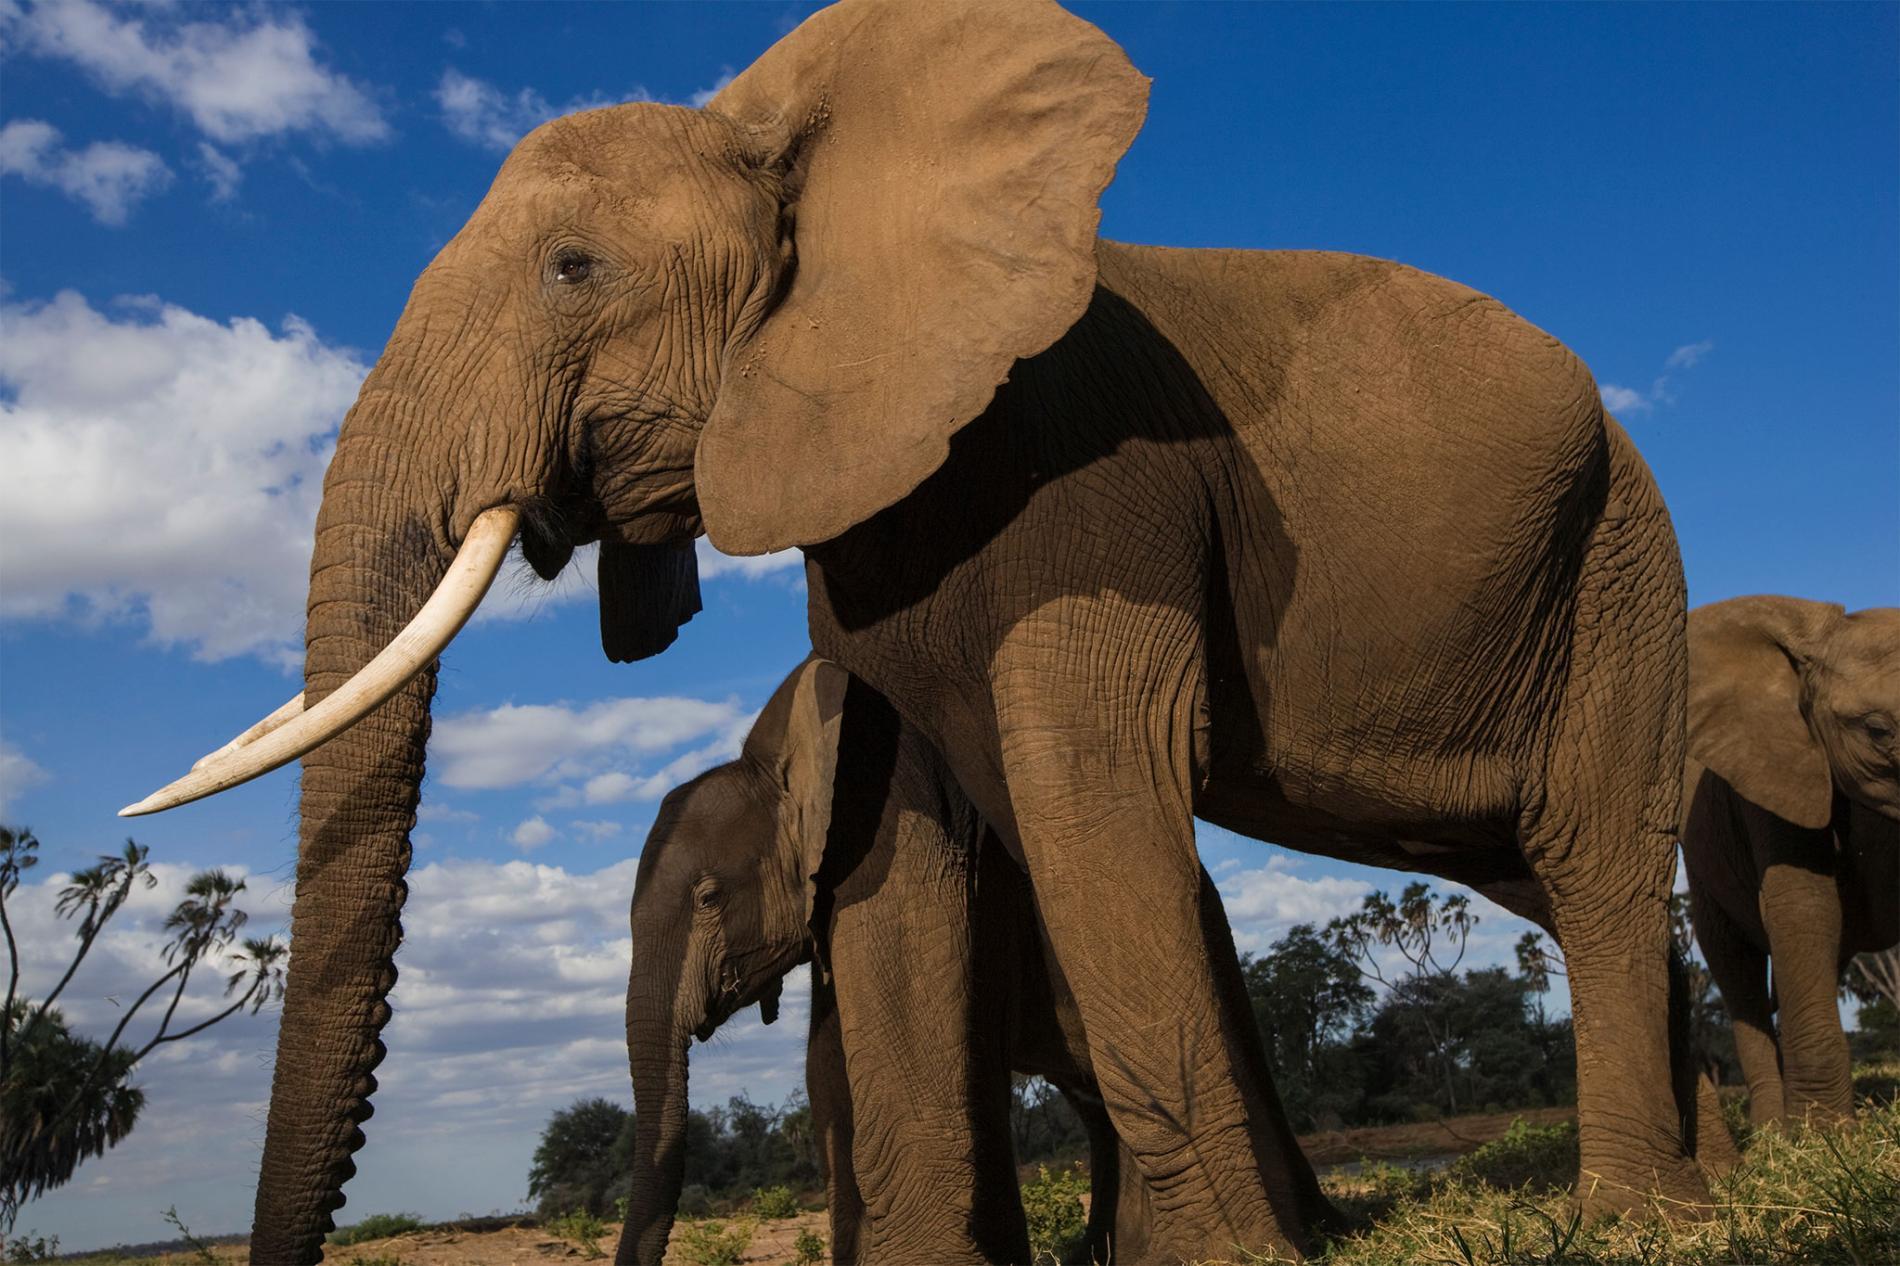 01-uk-ivory-ban.adapt.1900.1.jpg